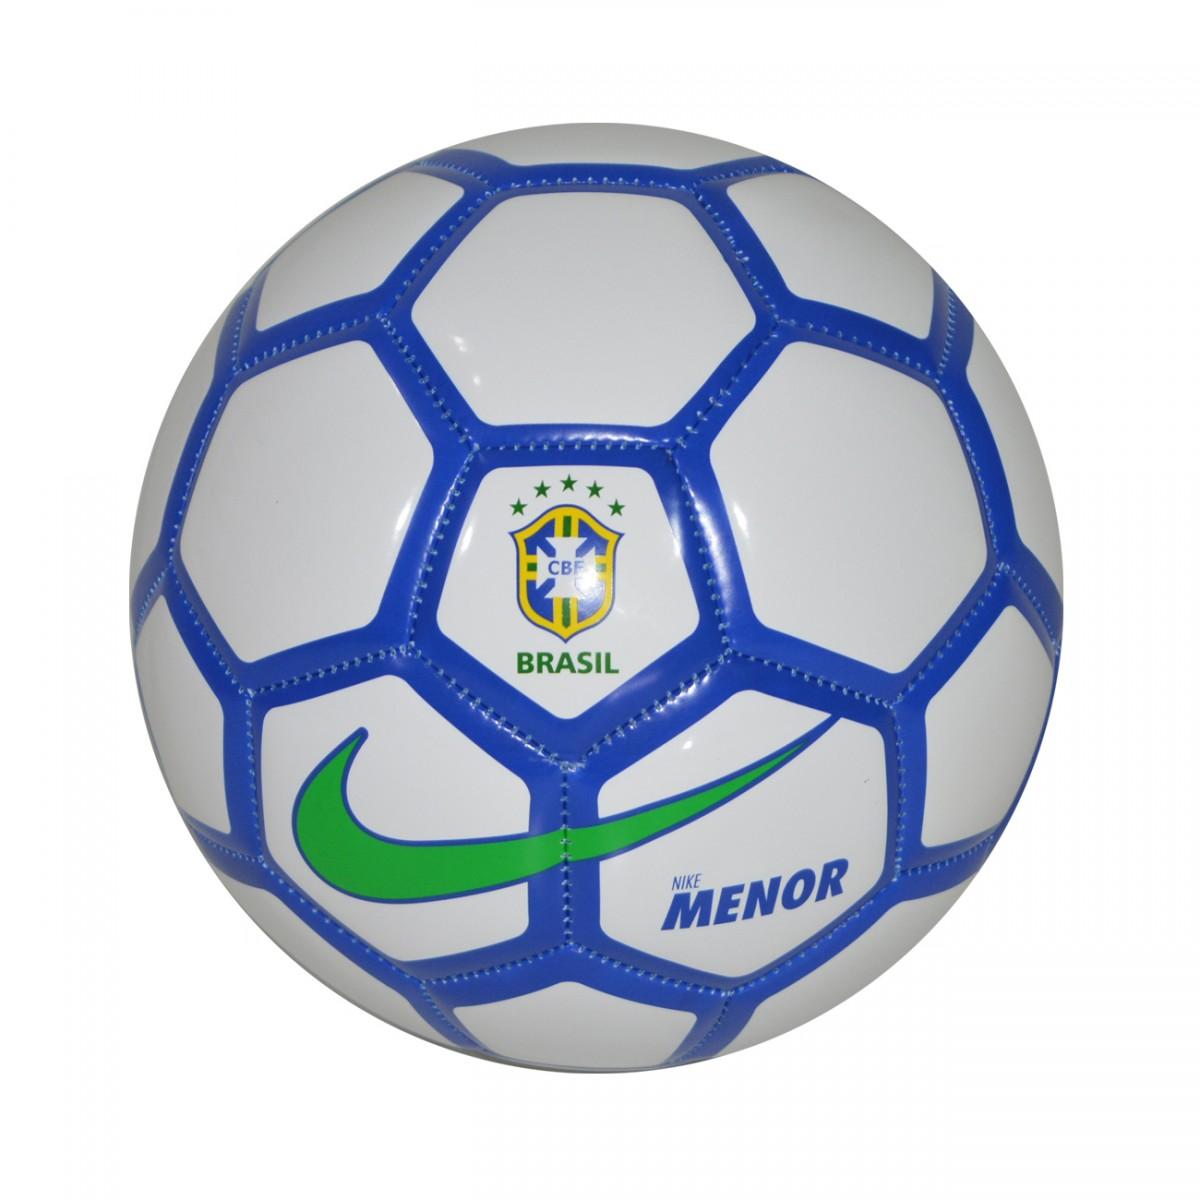 Bola Nike CBF Futsal SC2911 100 - Branco Azul Verde - Chuteira Nike ... febed84b4b9bb